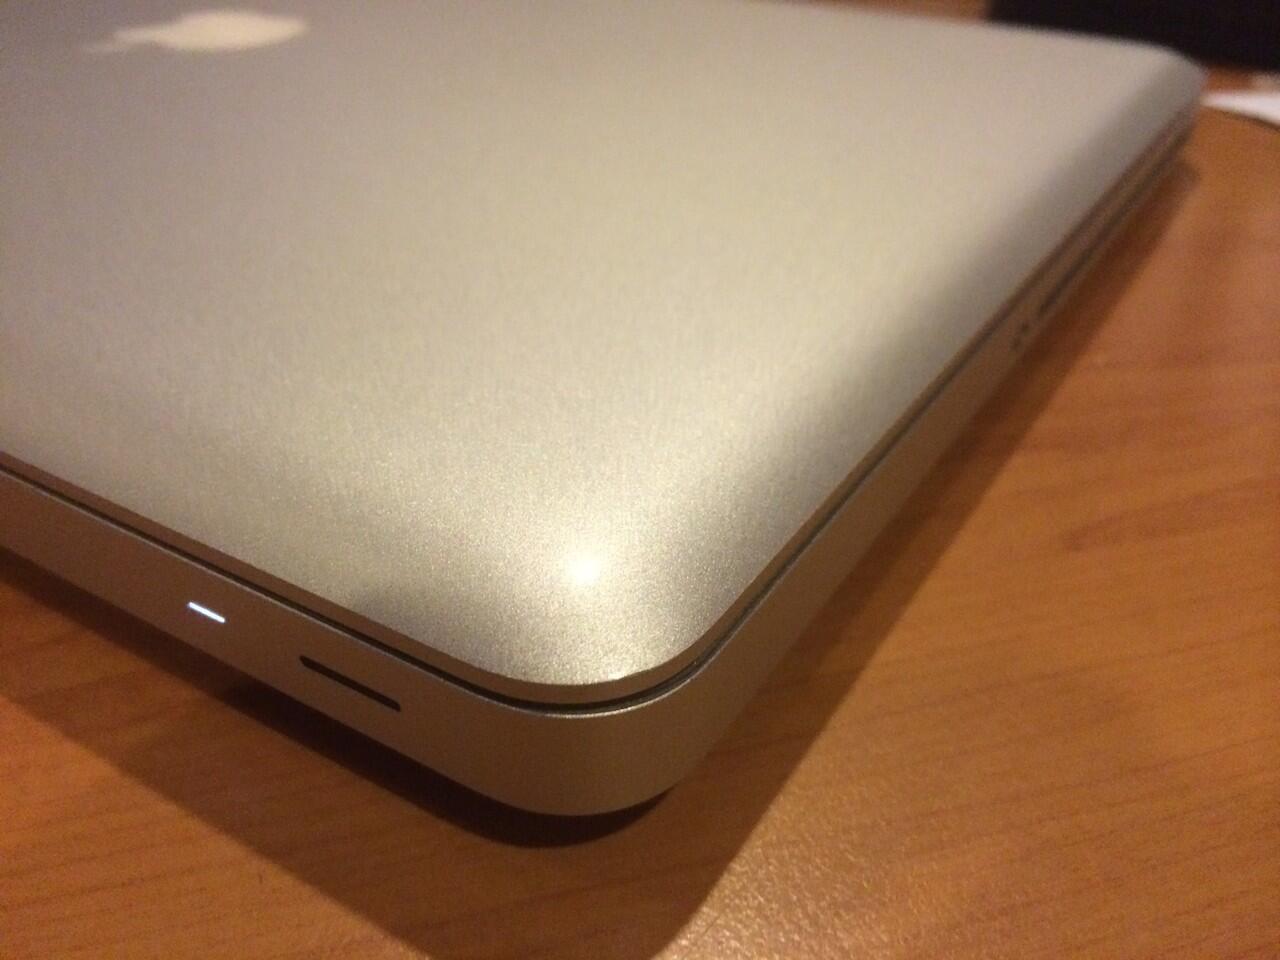 "Late 2011 MacBook Pro 15"" QuadCore i7 2.2GHz & 2.4GHz"